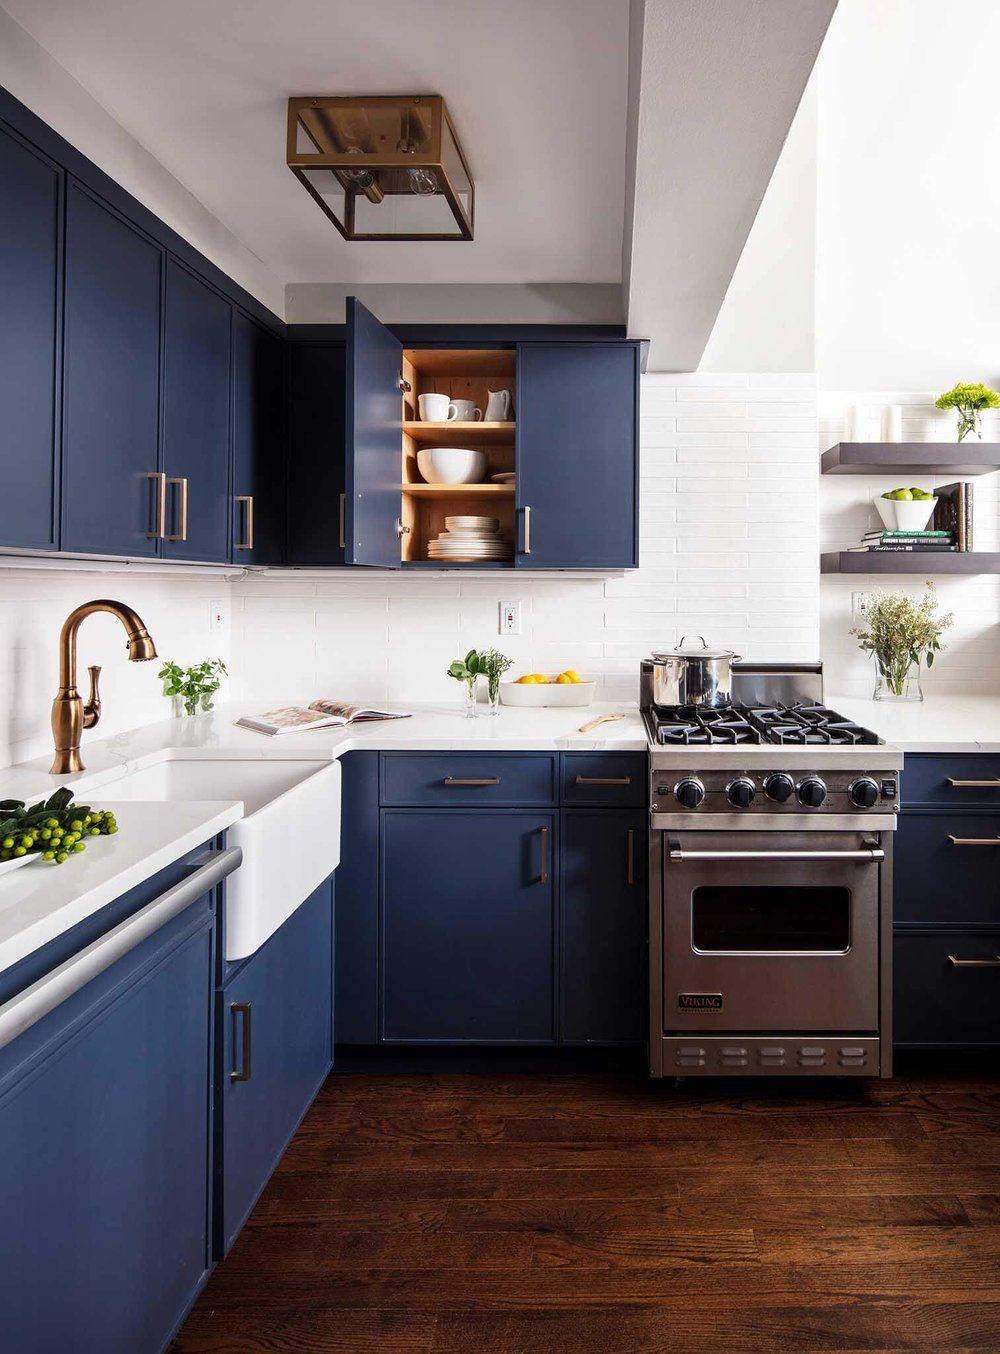 10 More Beautiful Blue Kitchens Cobalt Gold Interiordesign Interiorinspiration Kitchendesign Kitc Kitchen Style Blue Kitchens Kitchen Cabinet Design